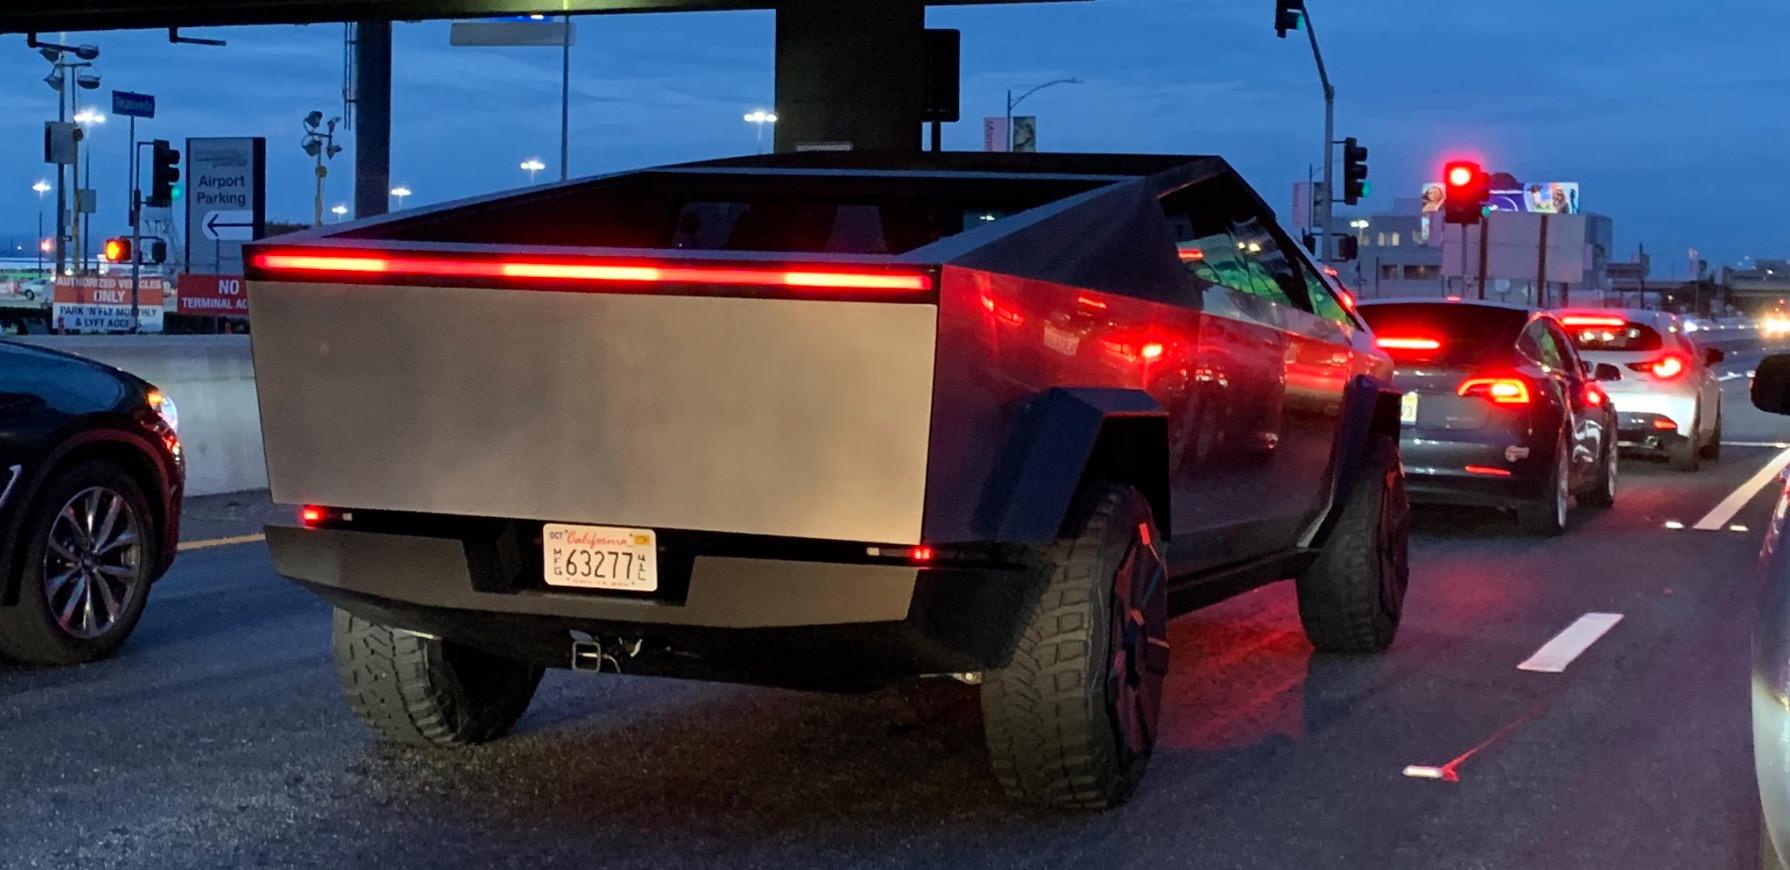 Tesla Cybertruck prototype spotted in the wild - looks massive - Electrek